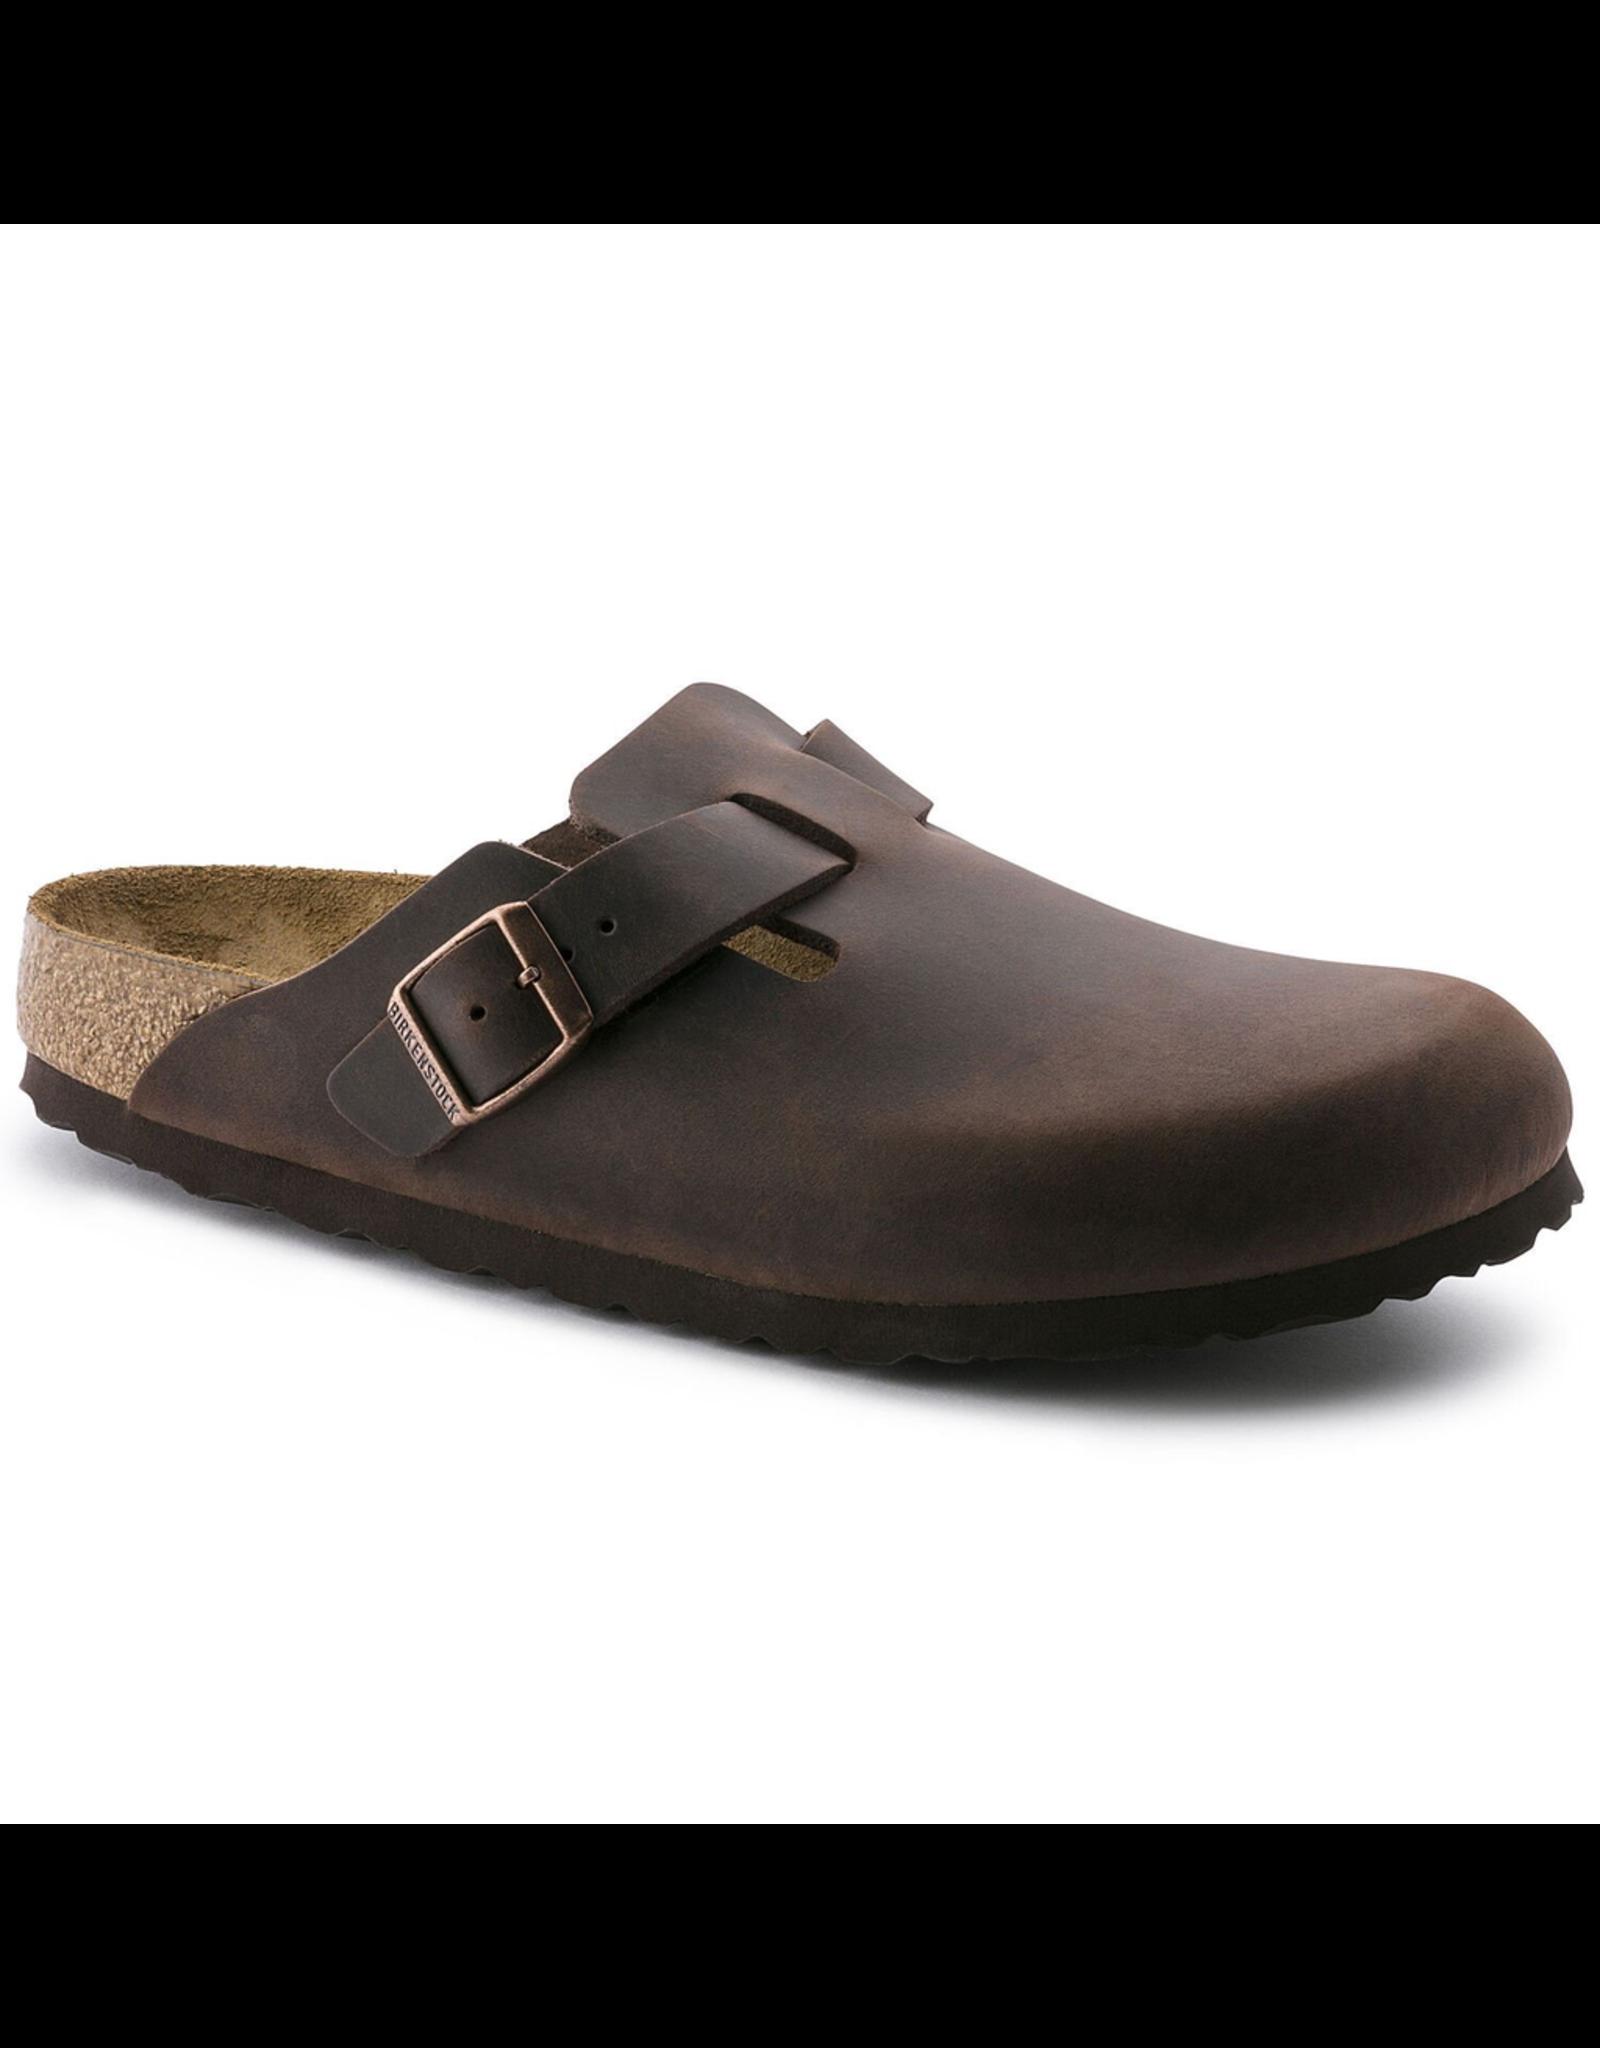 Birkenstock Boston Clog Soft Footbed - COV29552